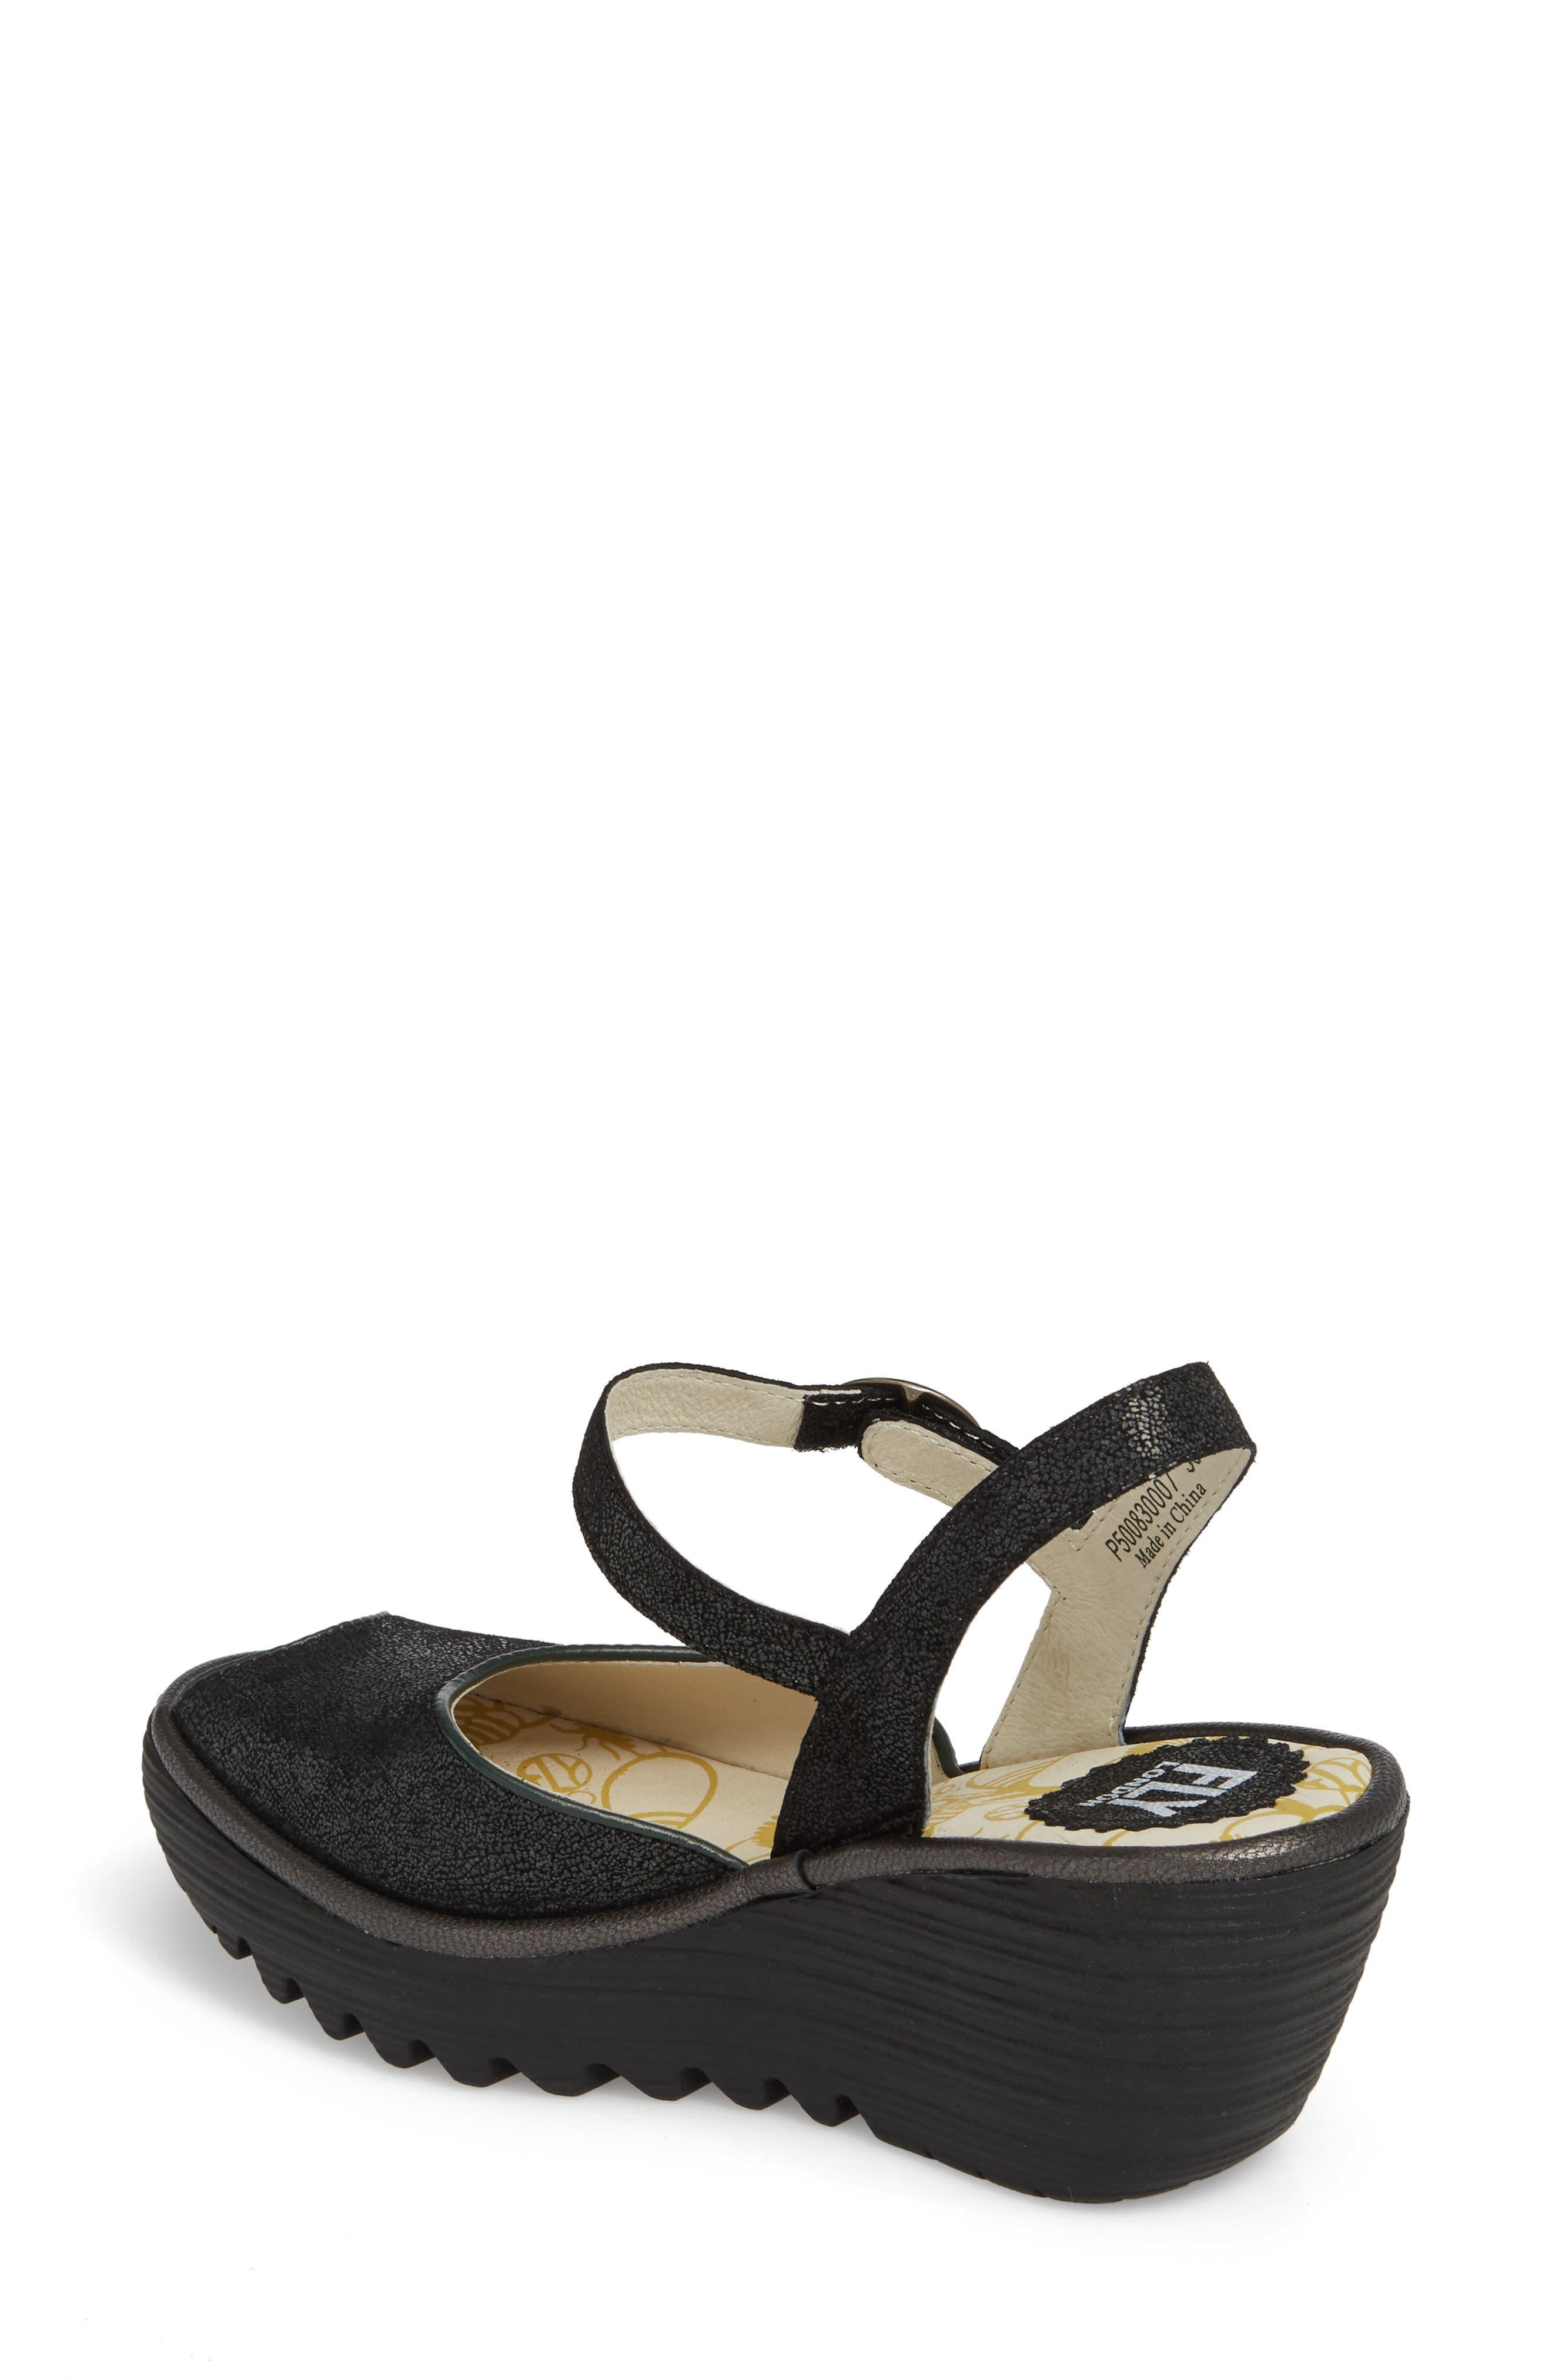 Yora Wedge Sandal,                             Alternate thumbnail 2, color,                             Black/ Graphite Leather